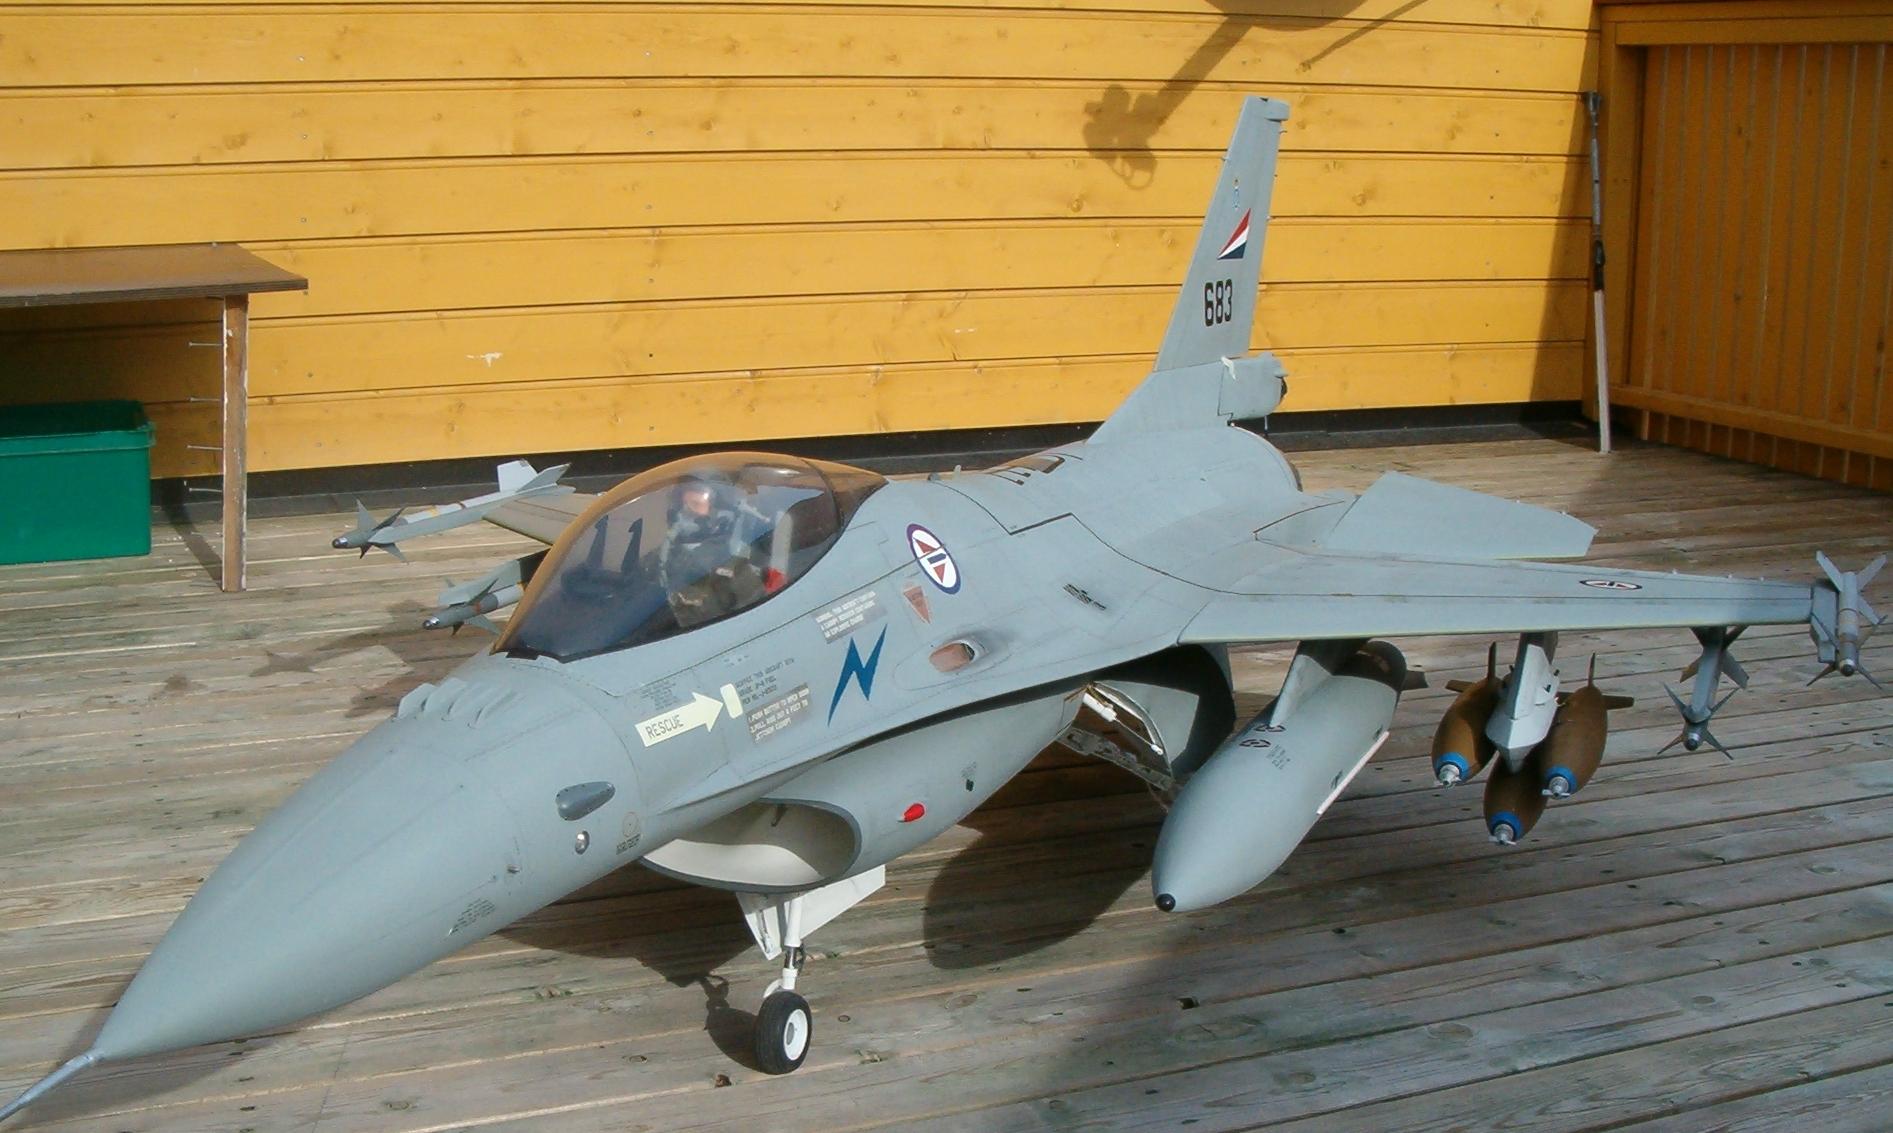 Philip Avonds Scale Jets F 16a